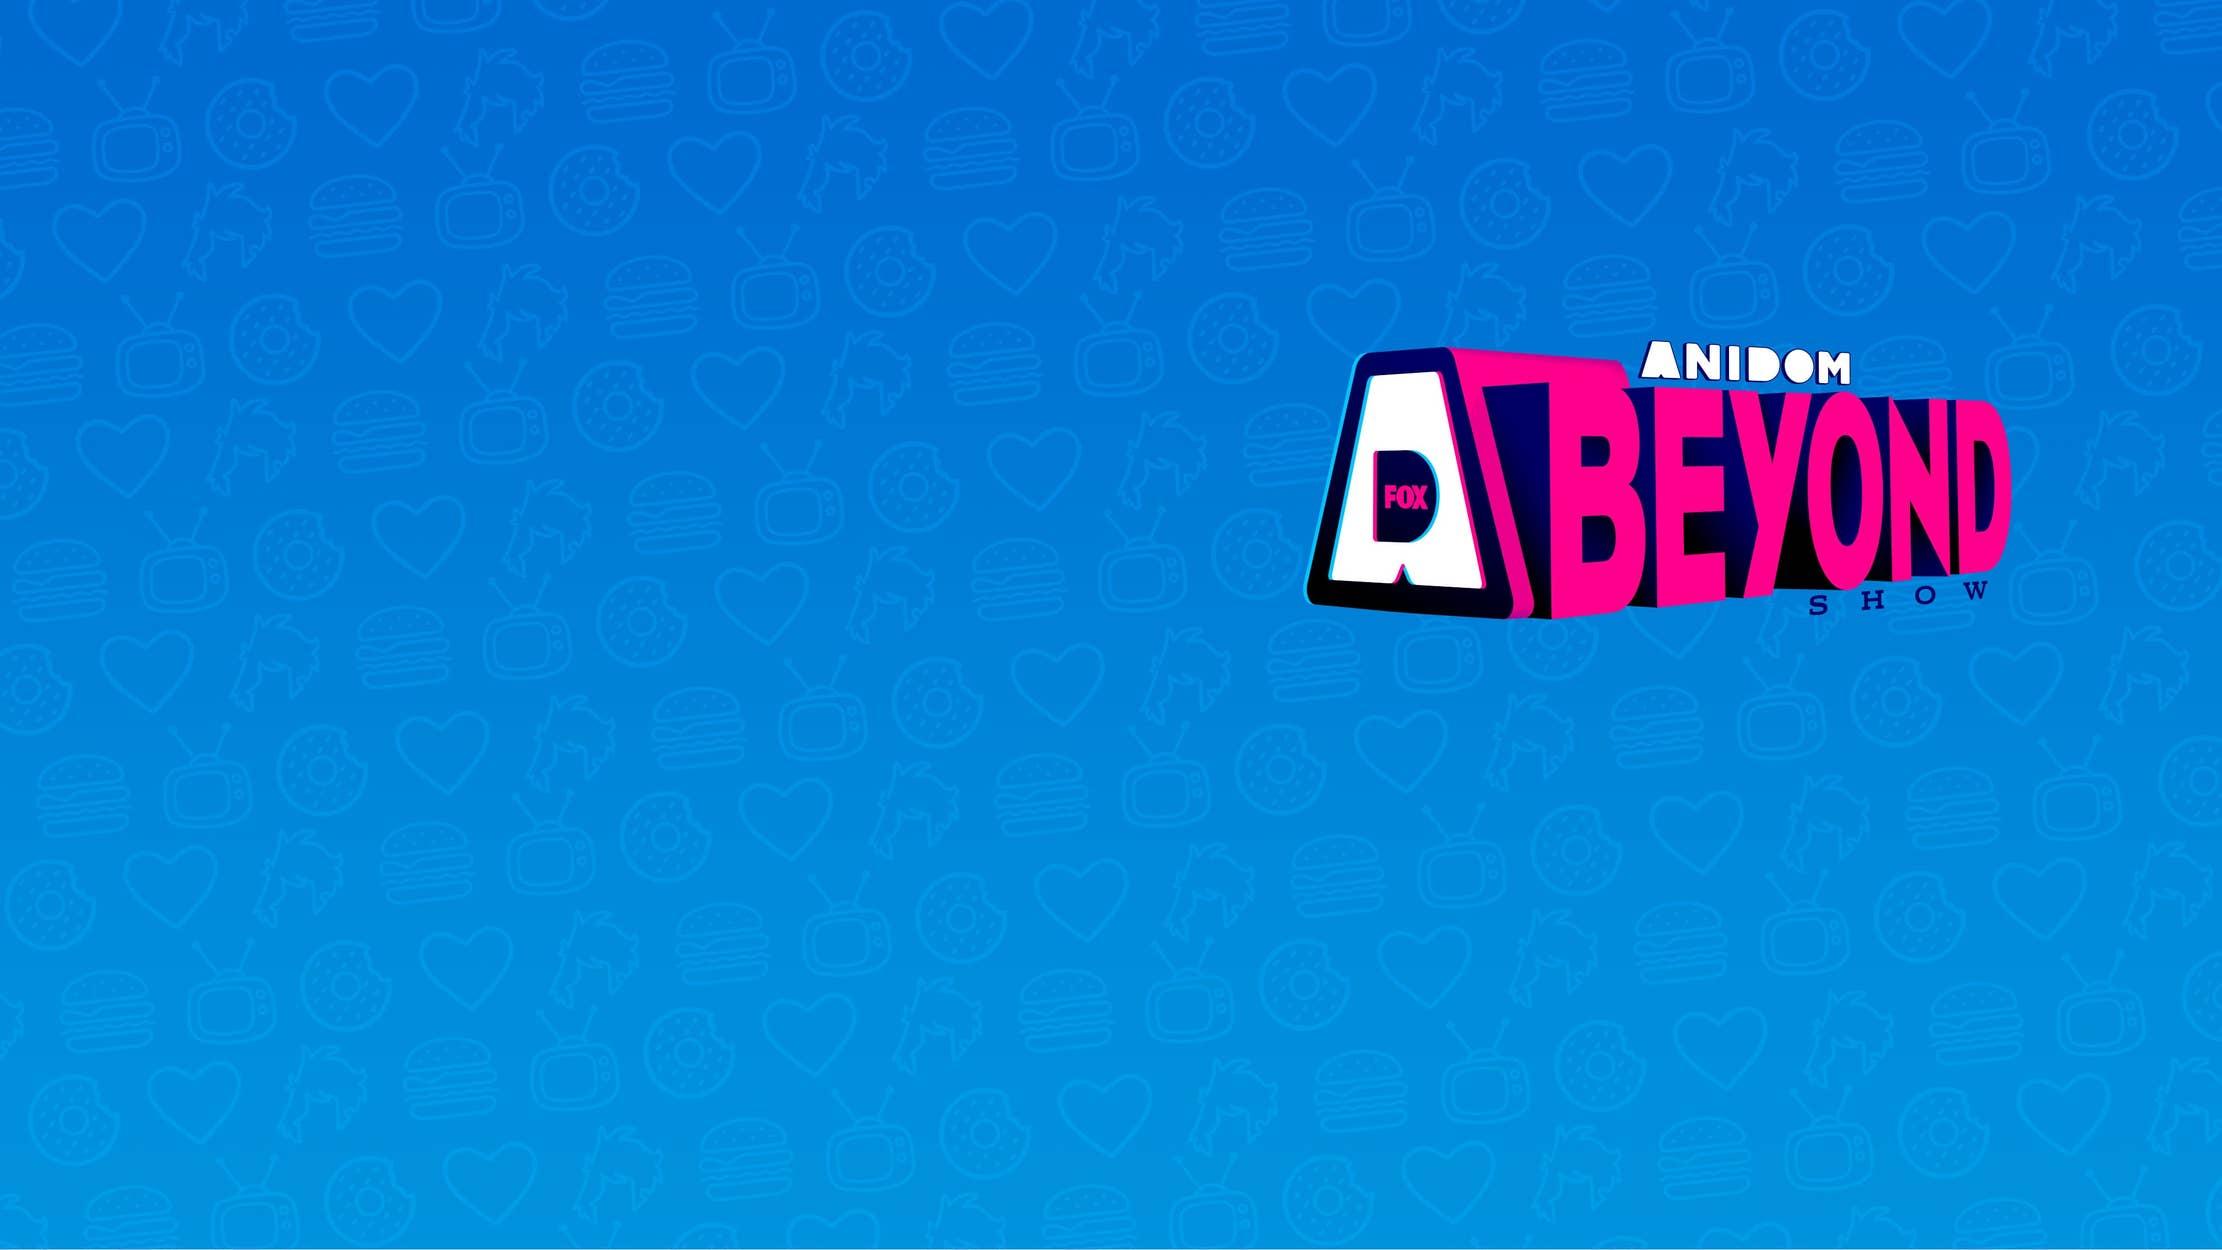 AniDom Beyond seriesDetail